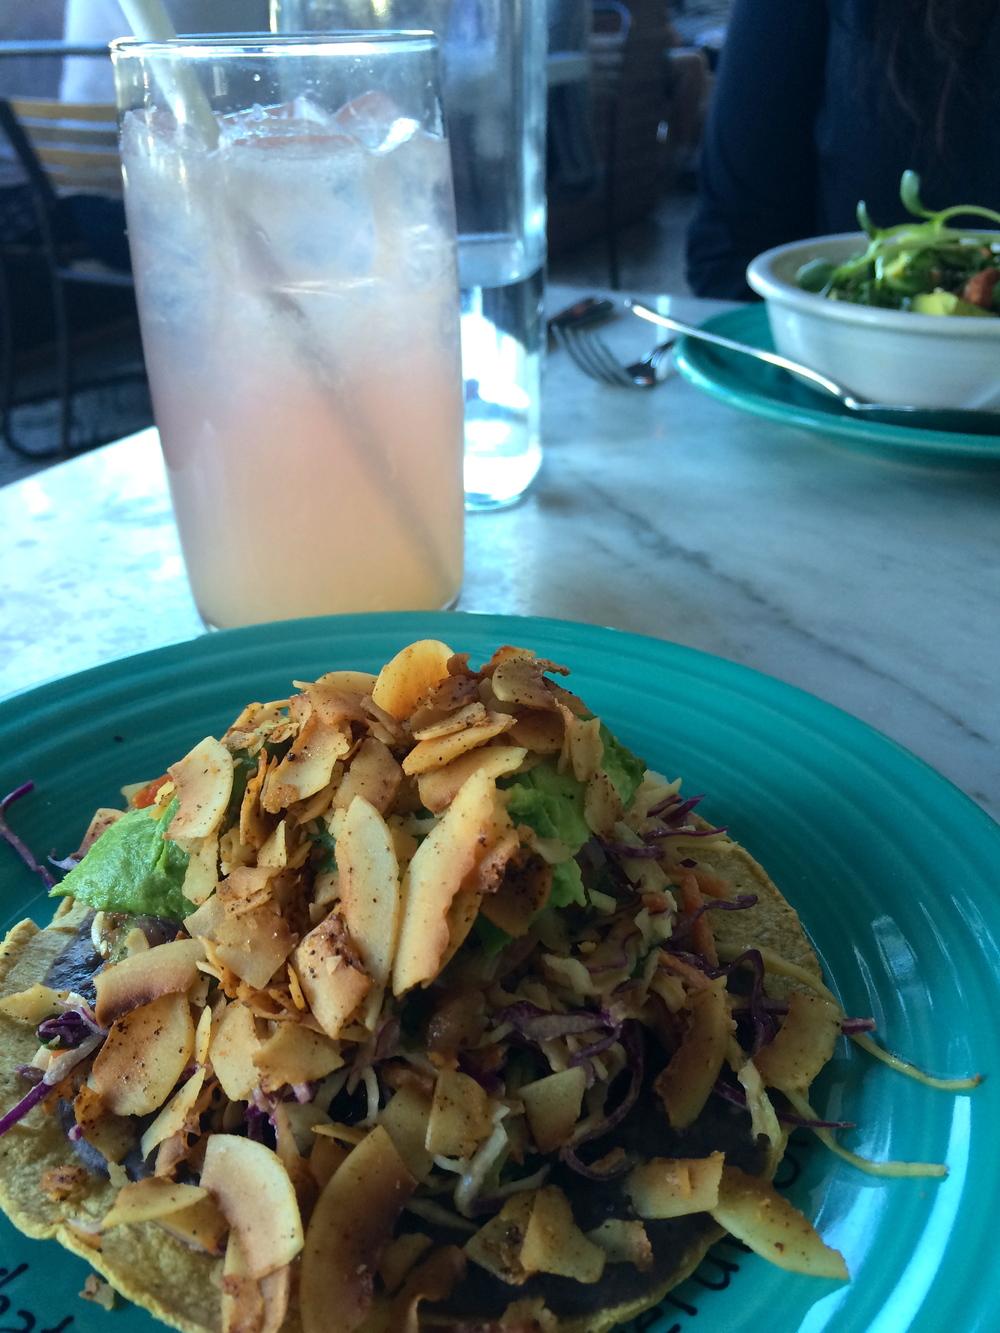 Cafe Gratitude - YO SOY FELIZ Portobello Mushroom Tostada.